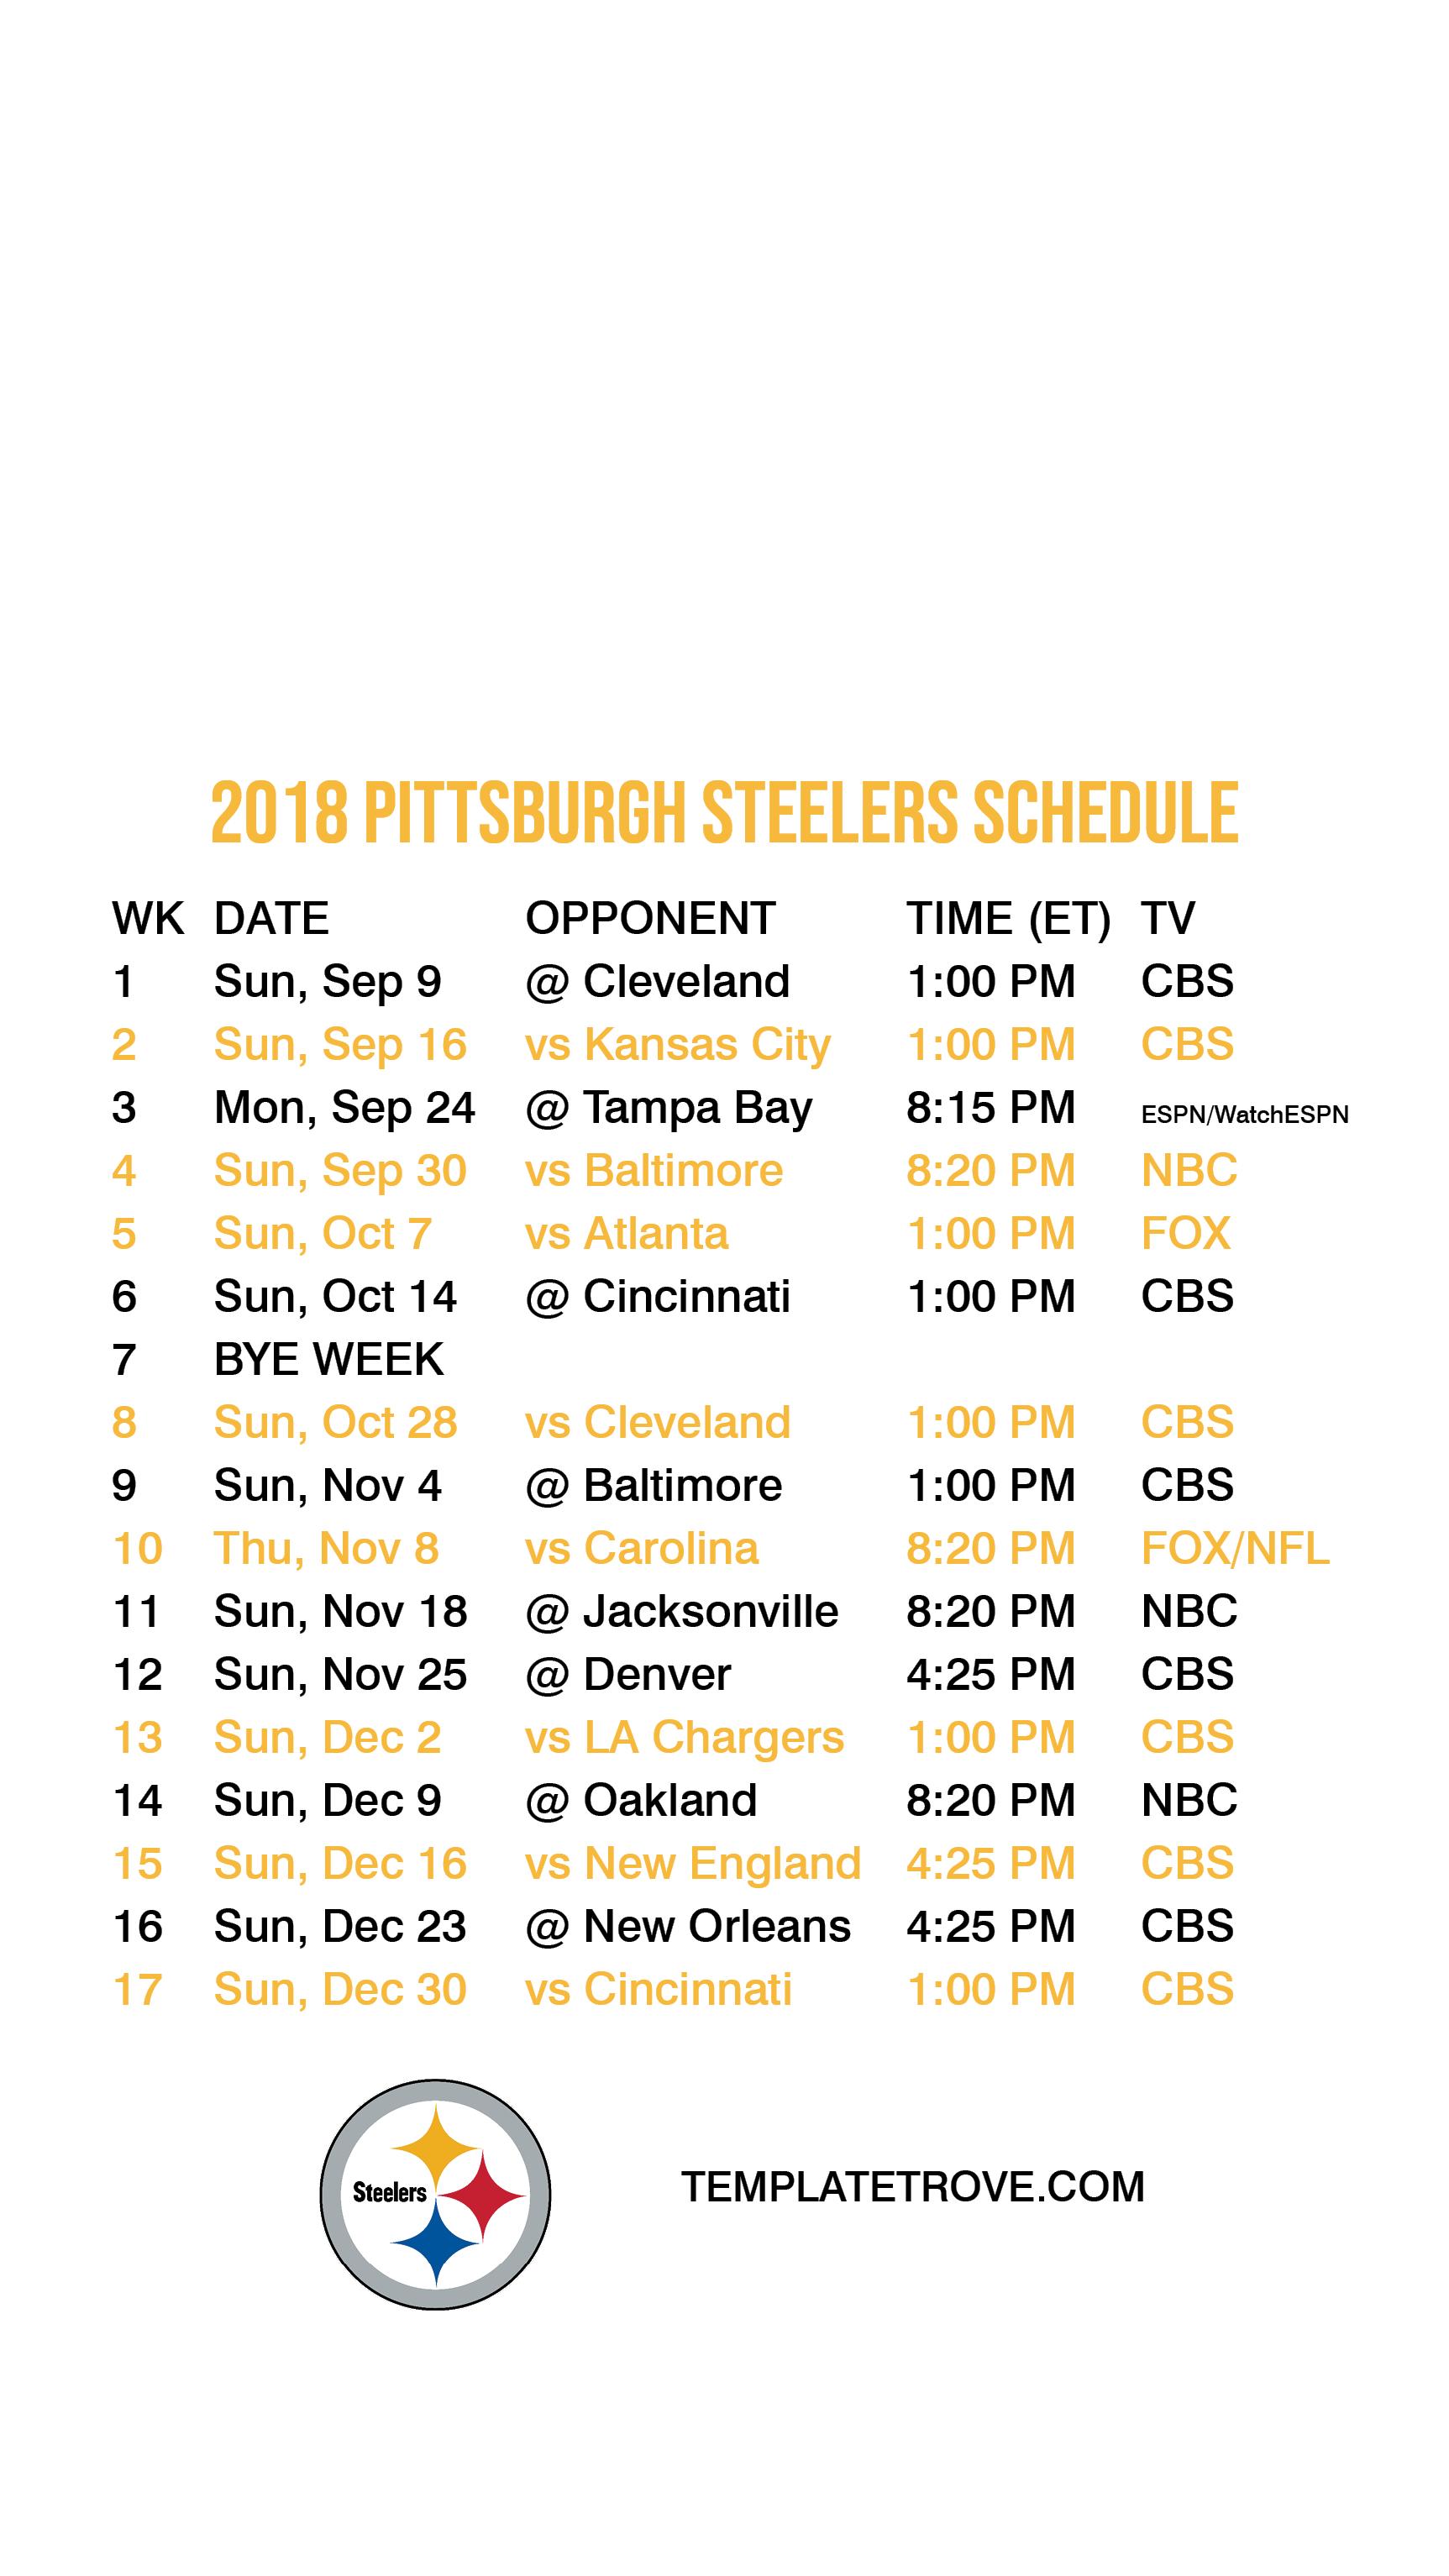 photograph regarding Pittsburgh Steelers Printable Schedule identified as 2018-2019 Pittsburgh Steelers Lock Display Timetable for